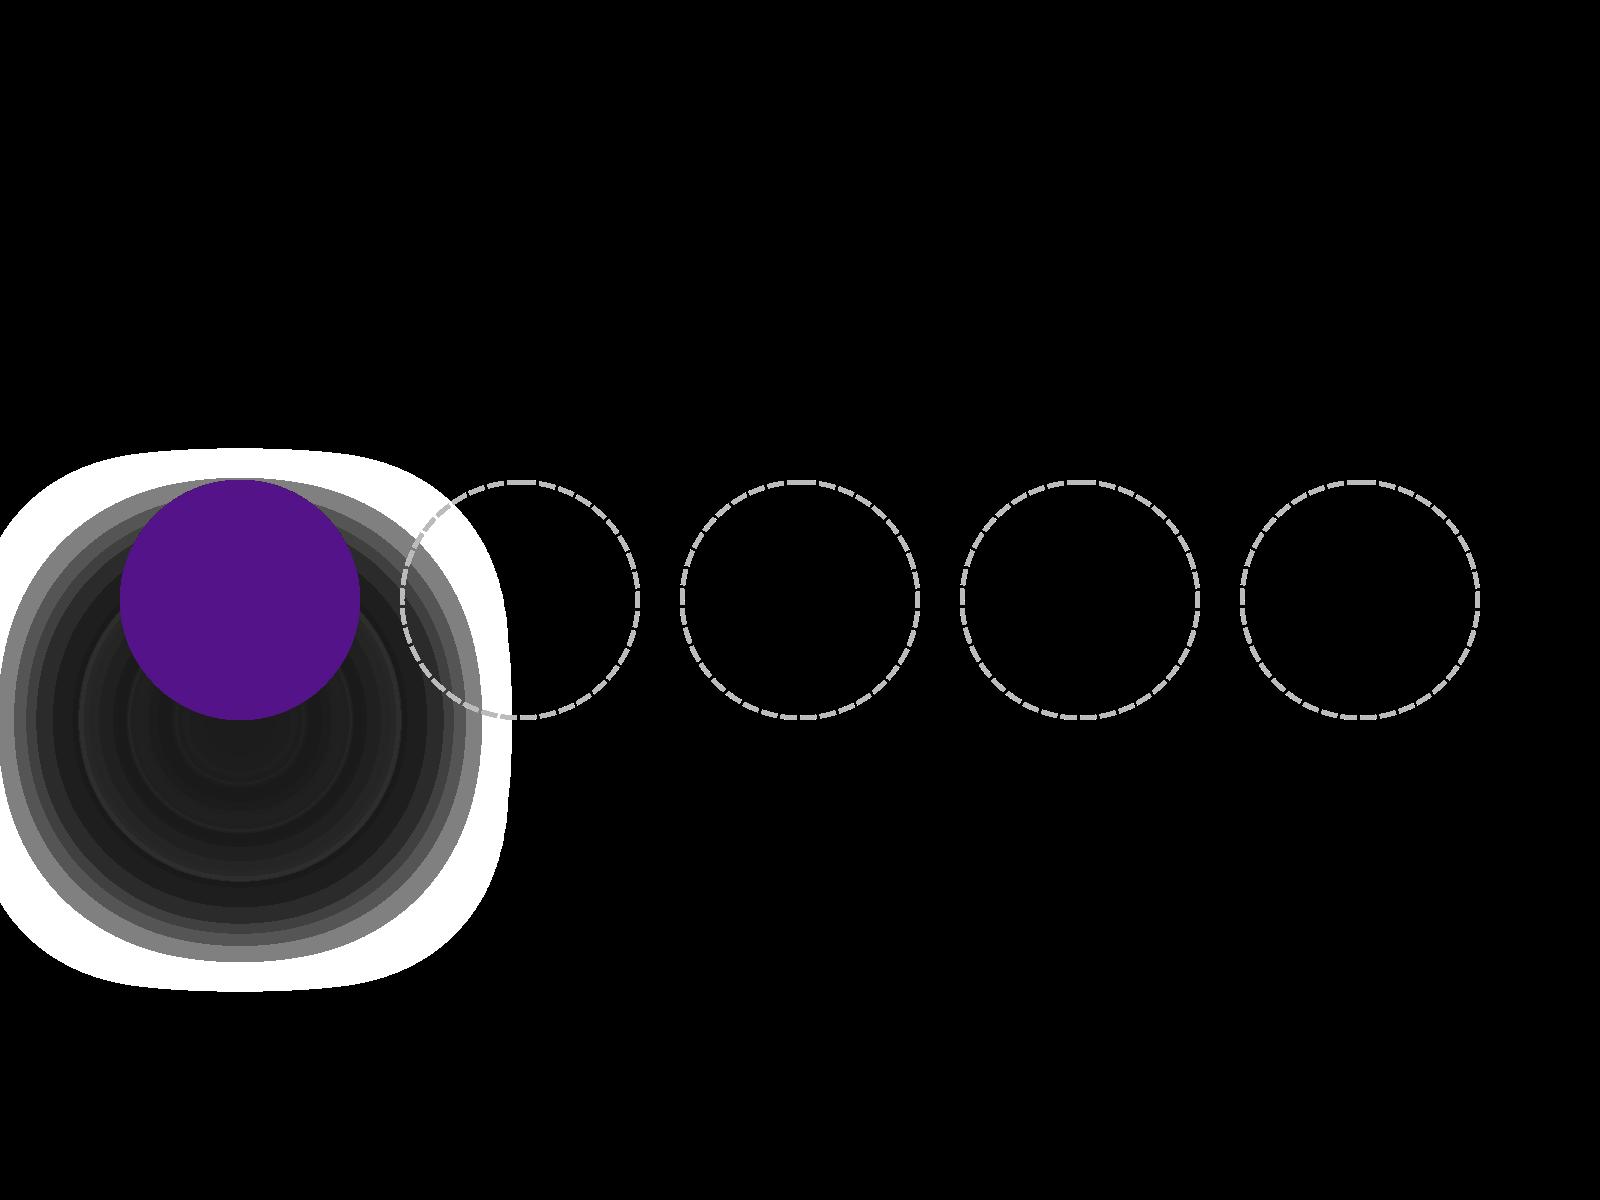 5fa0f56b920445795f5cc13b_image_main_colors@2x.